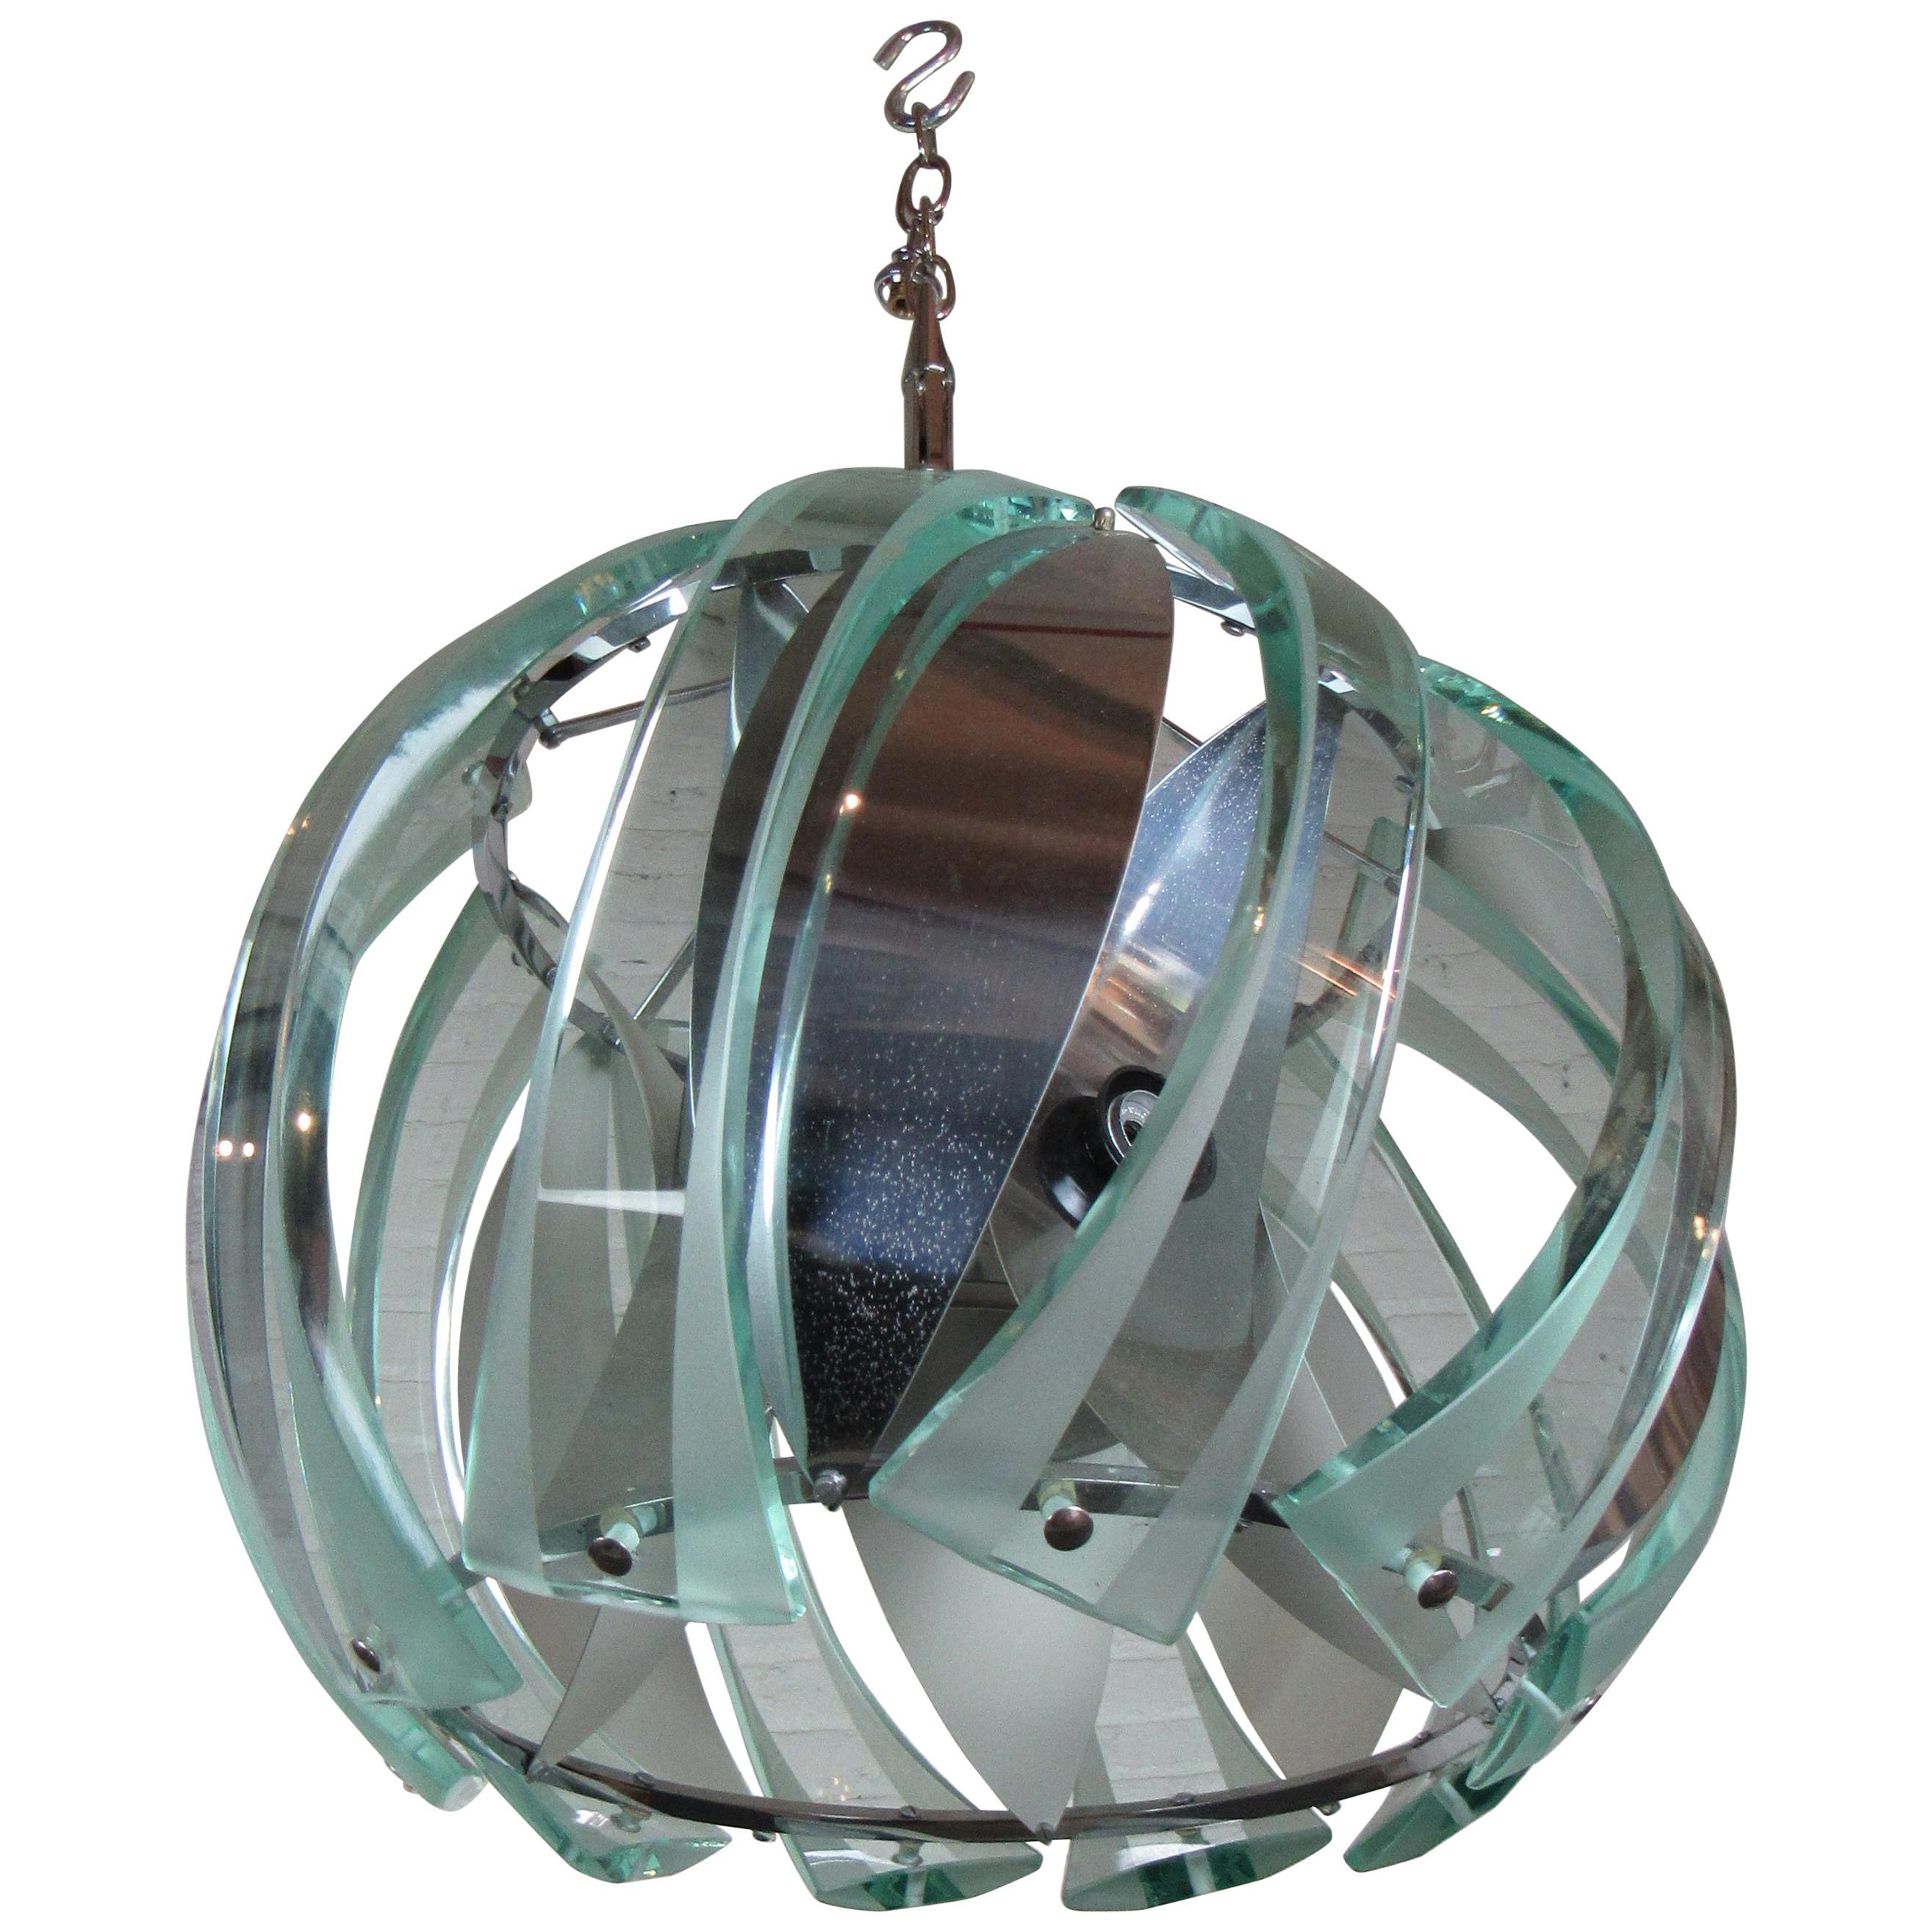 Vintage Glass and Metal Pendant